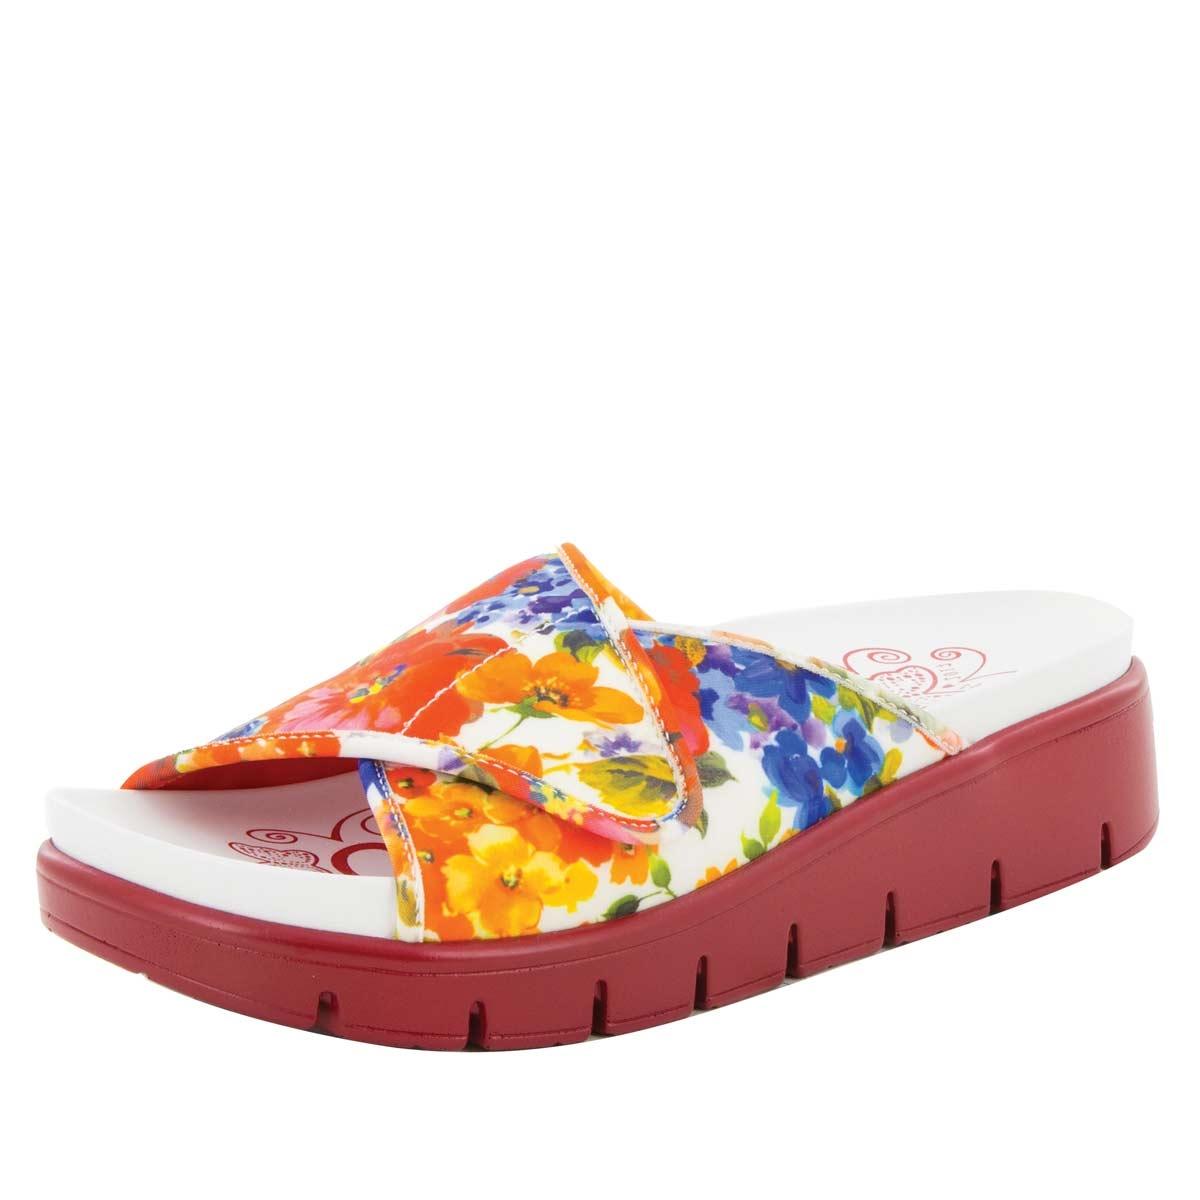 Alegria Alli Leaded slip resistant women's comfort shoe, Alegria Airie  Florever comfort sandals for women ...